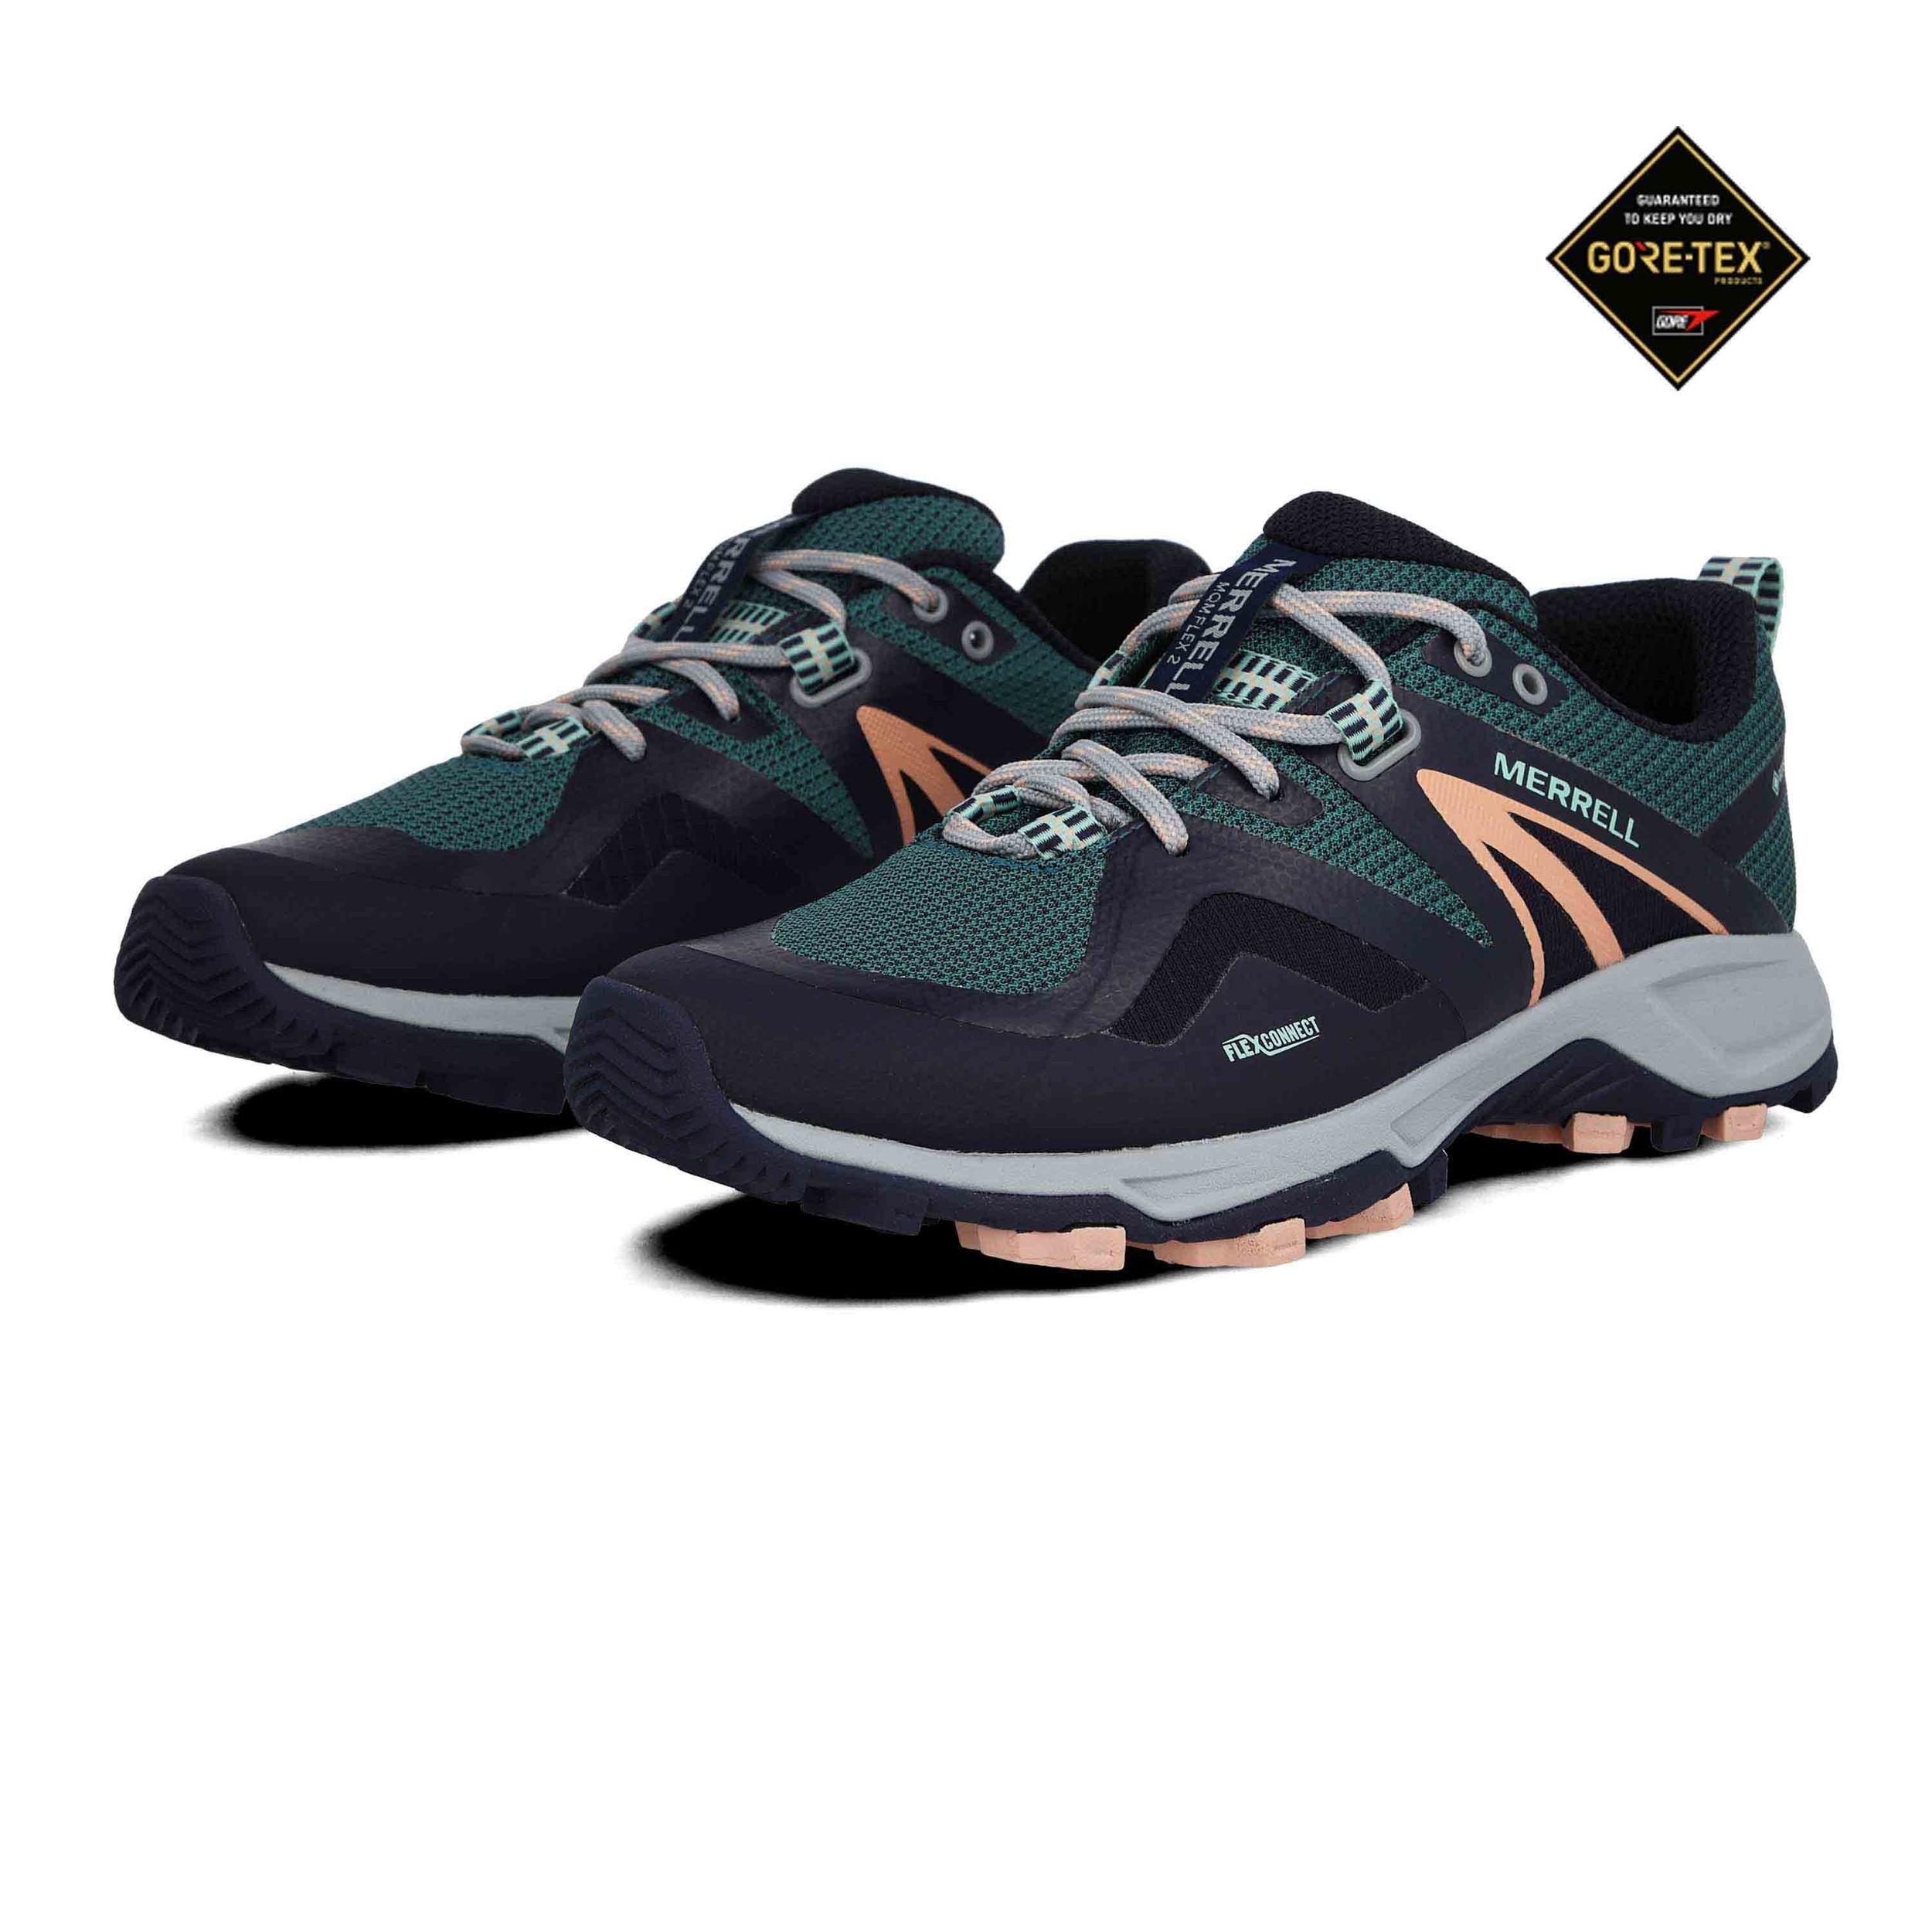 Merrell MQM Flex 2 GORE-TEX Women's Walking Shoes - AW21